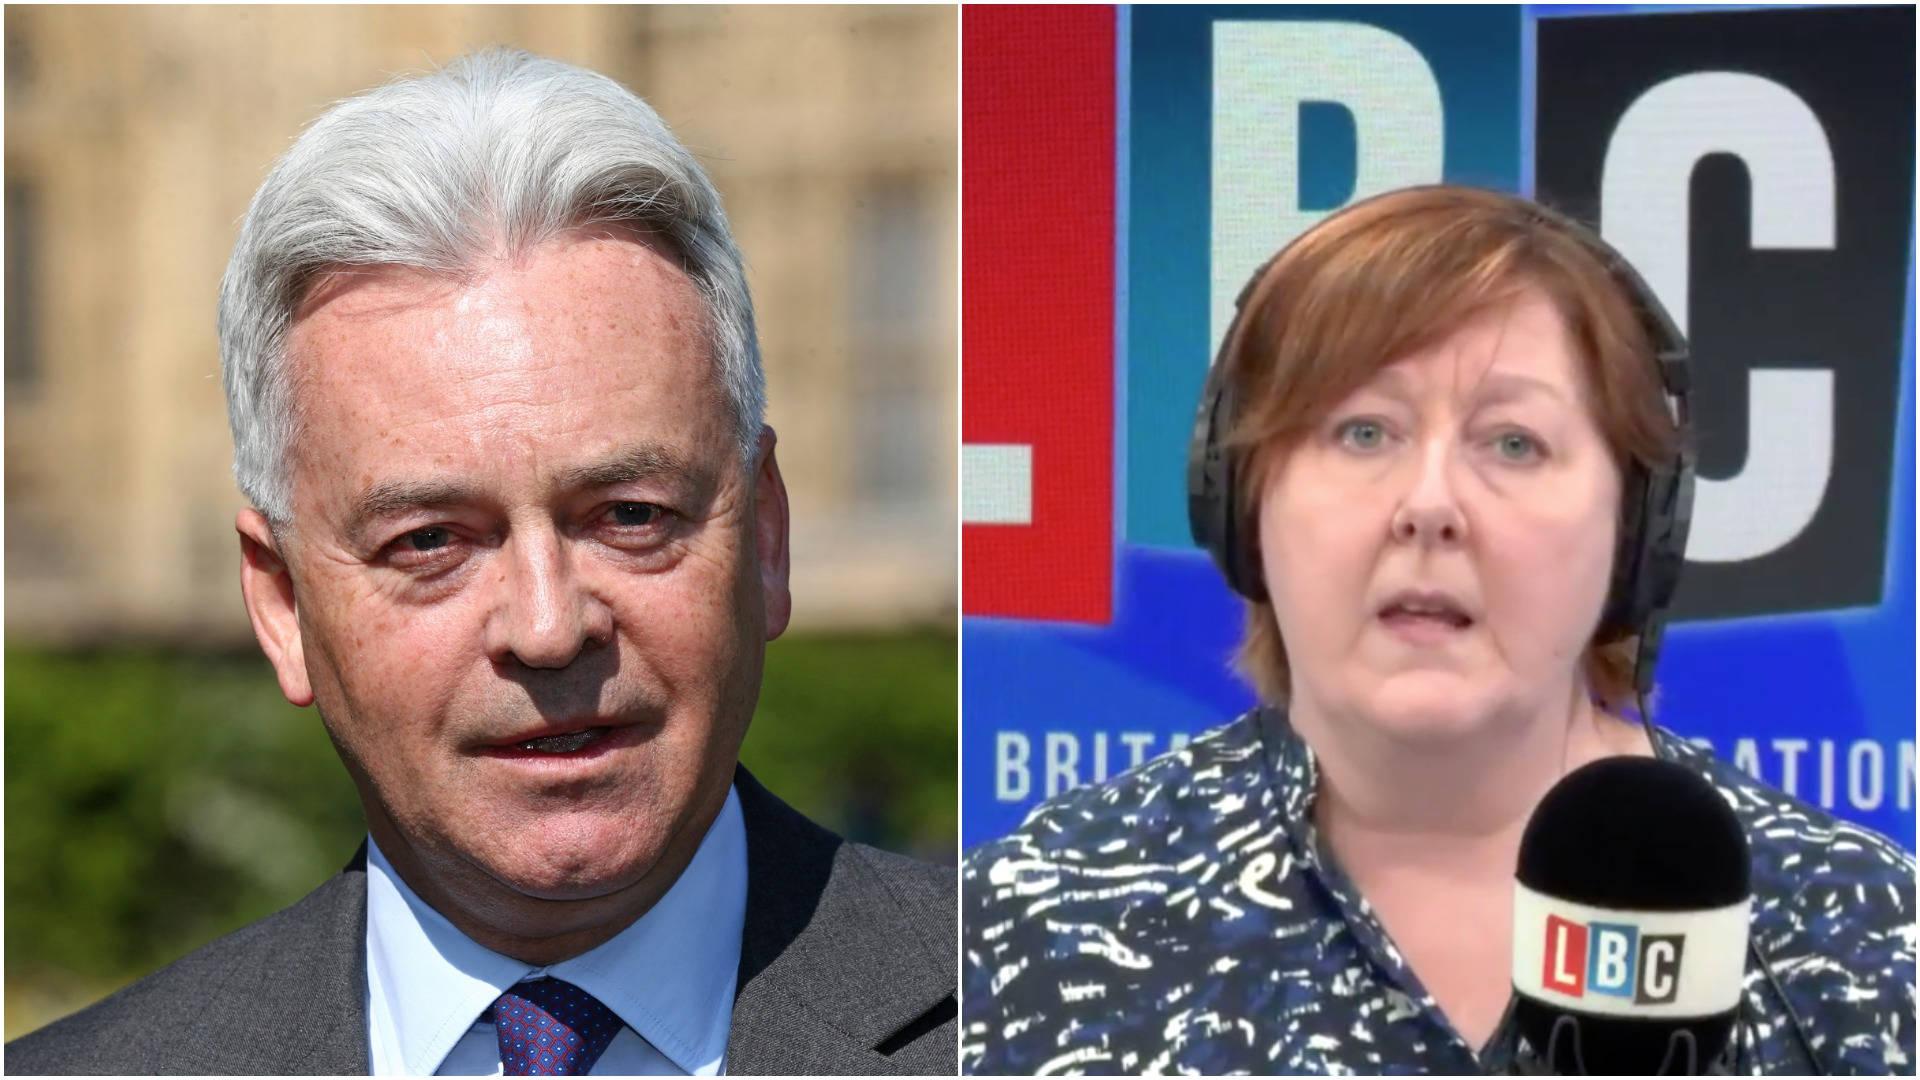 Alan Duncan: Boris Johnson Threw Sir Kim Darroch Under The Bus To Suck Up To Trump